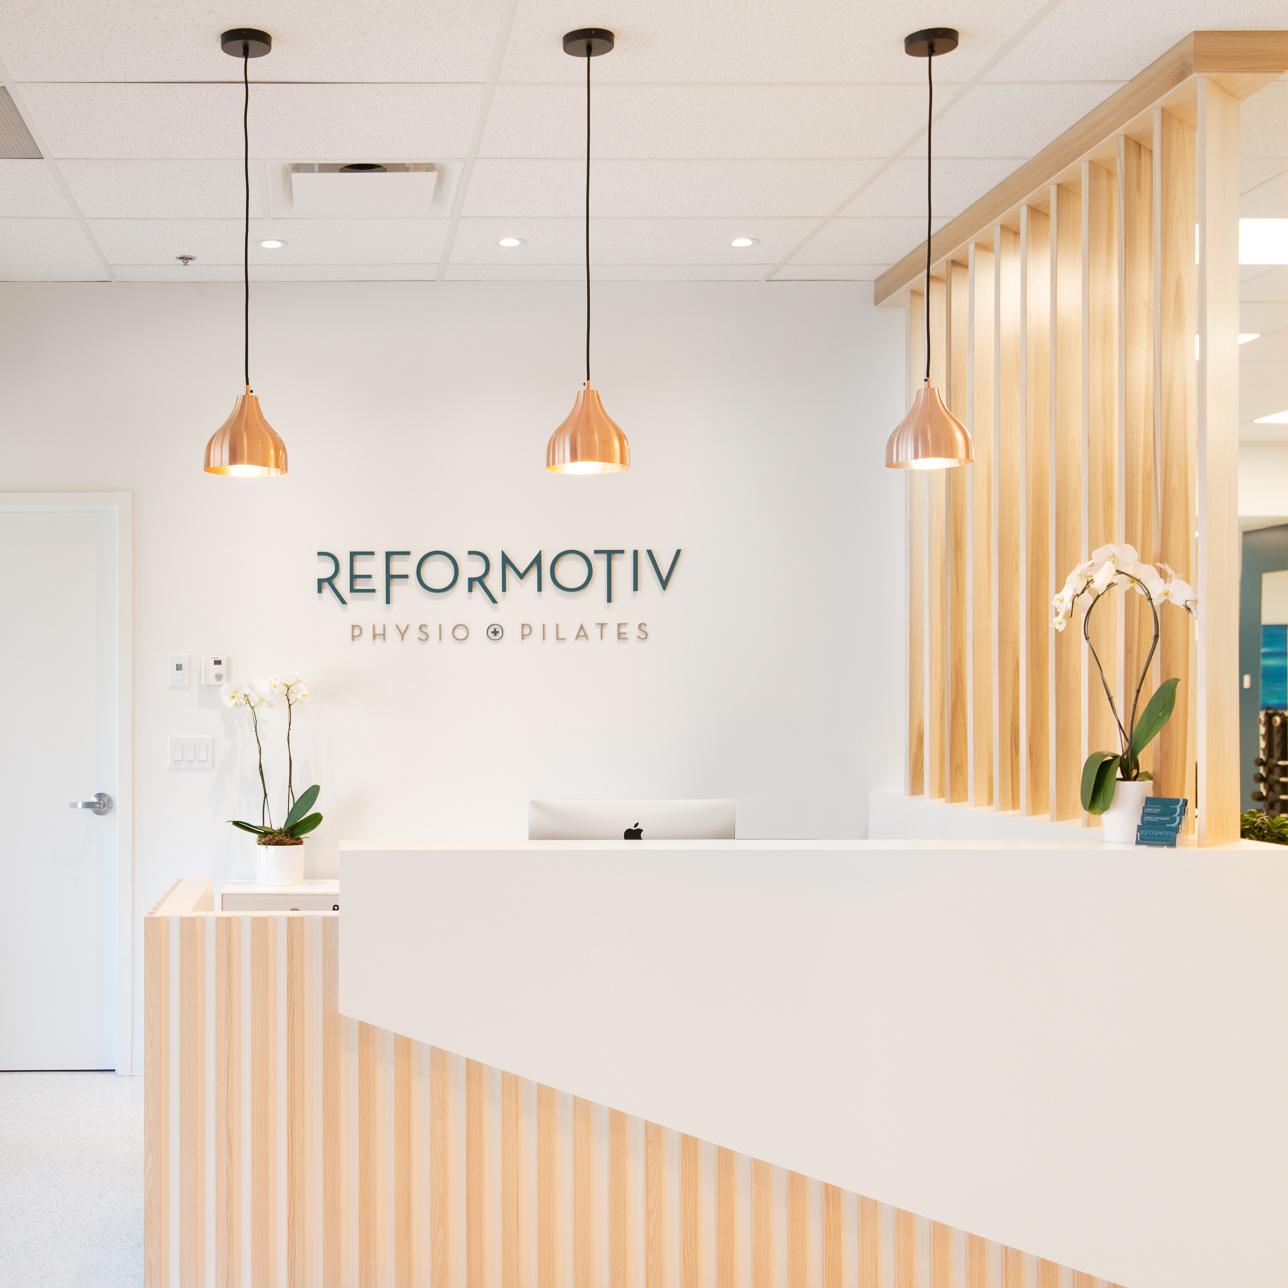 Reormotiv website design by Jennifer Miranda and Flipside Creative.